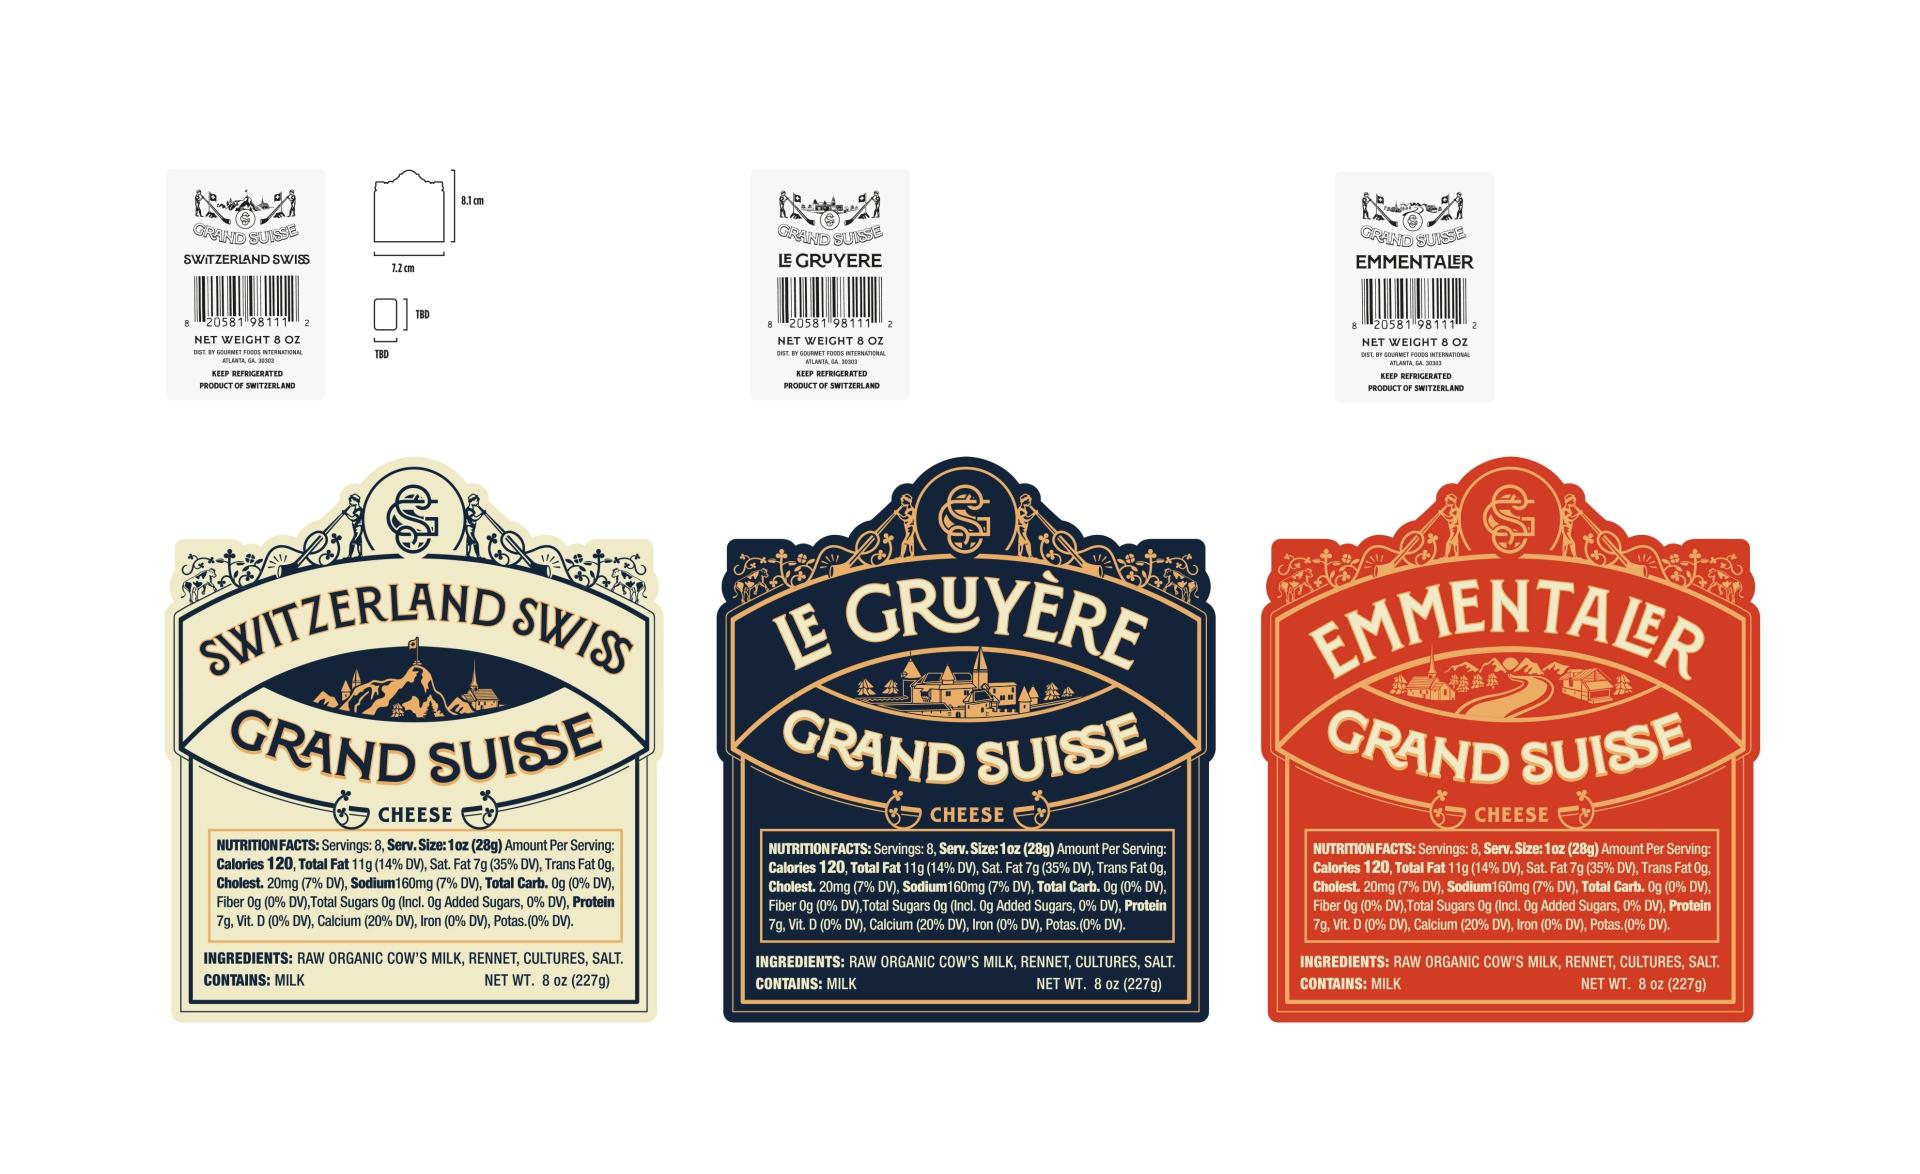 label-cheese-placement-guide-emmentaler-flat-preview-grand-suisse-close-zeki-michael-design-branding-studio-packaging-red-copy-copy-copy copy